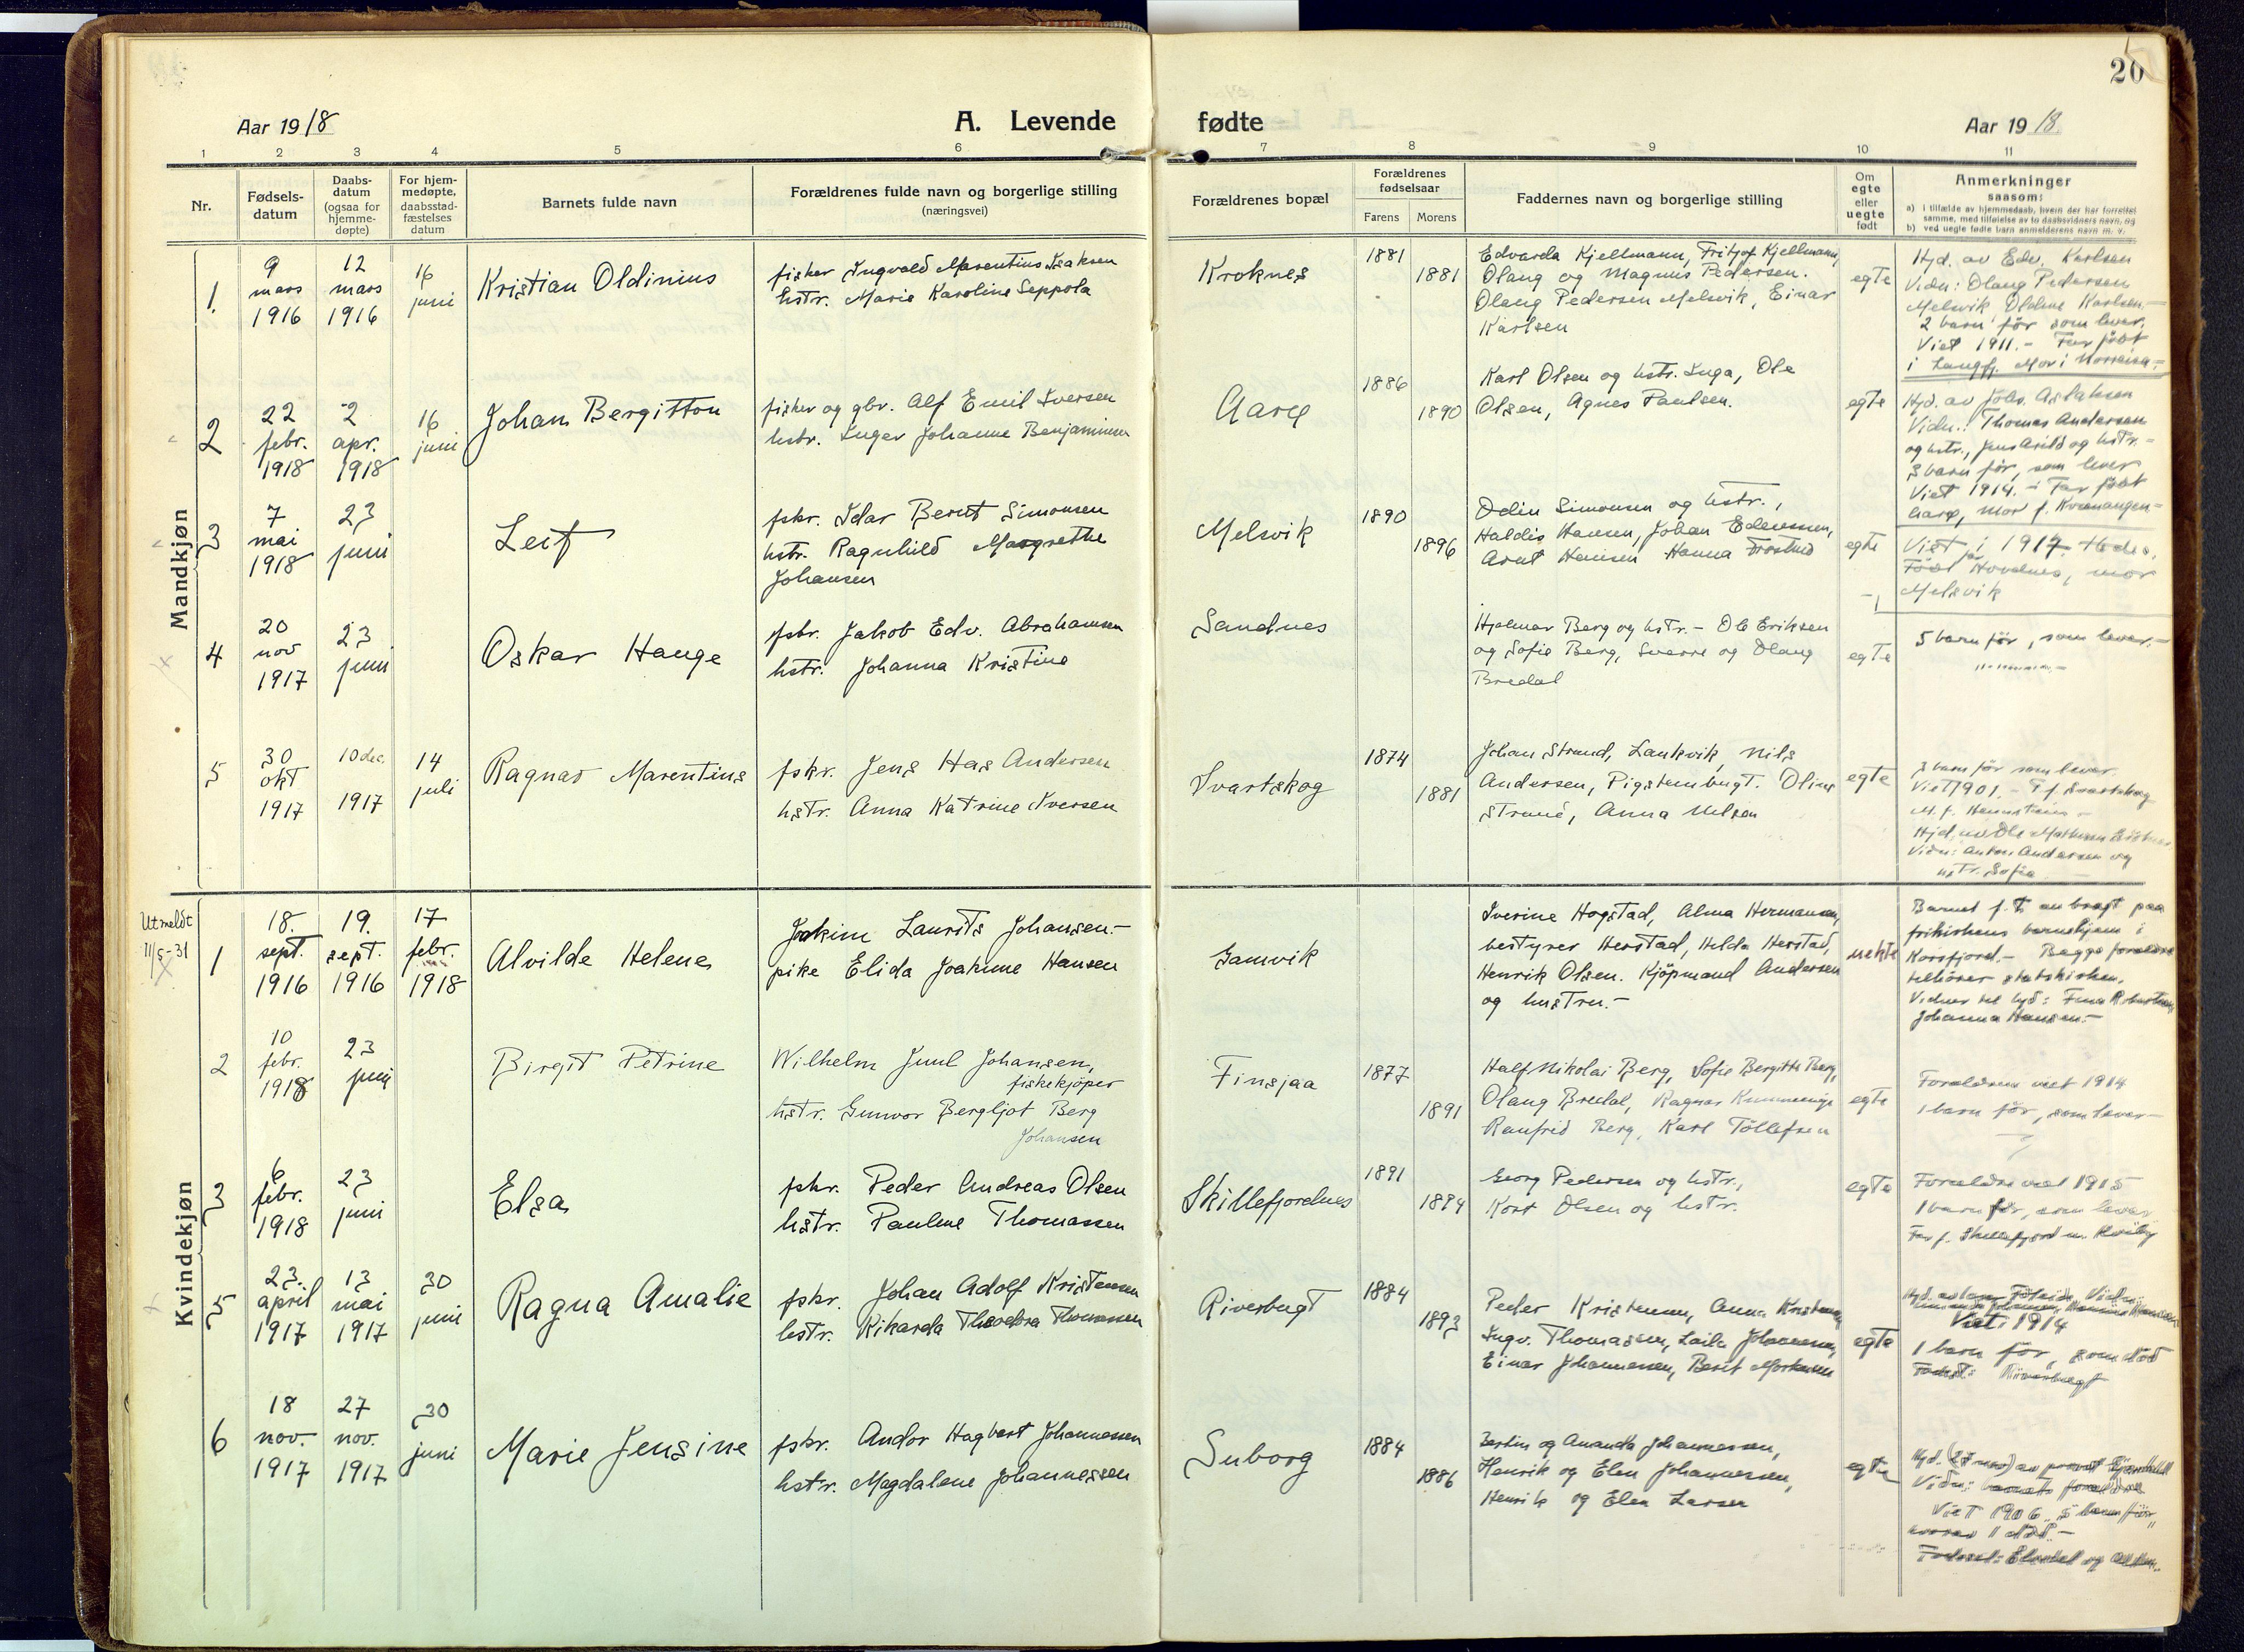 SATØ, Talvik sokneprestkontor, H/Ha/L0018kirke: Ministerialbok nr. 18, 1915-1924, s. 20